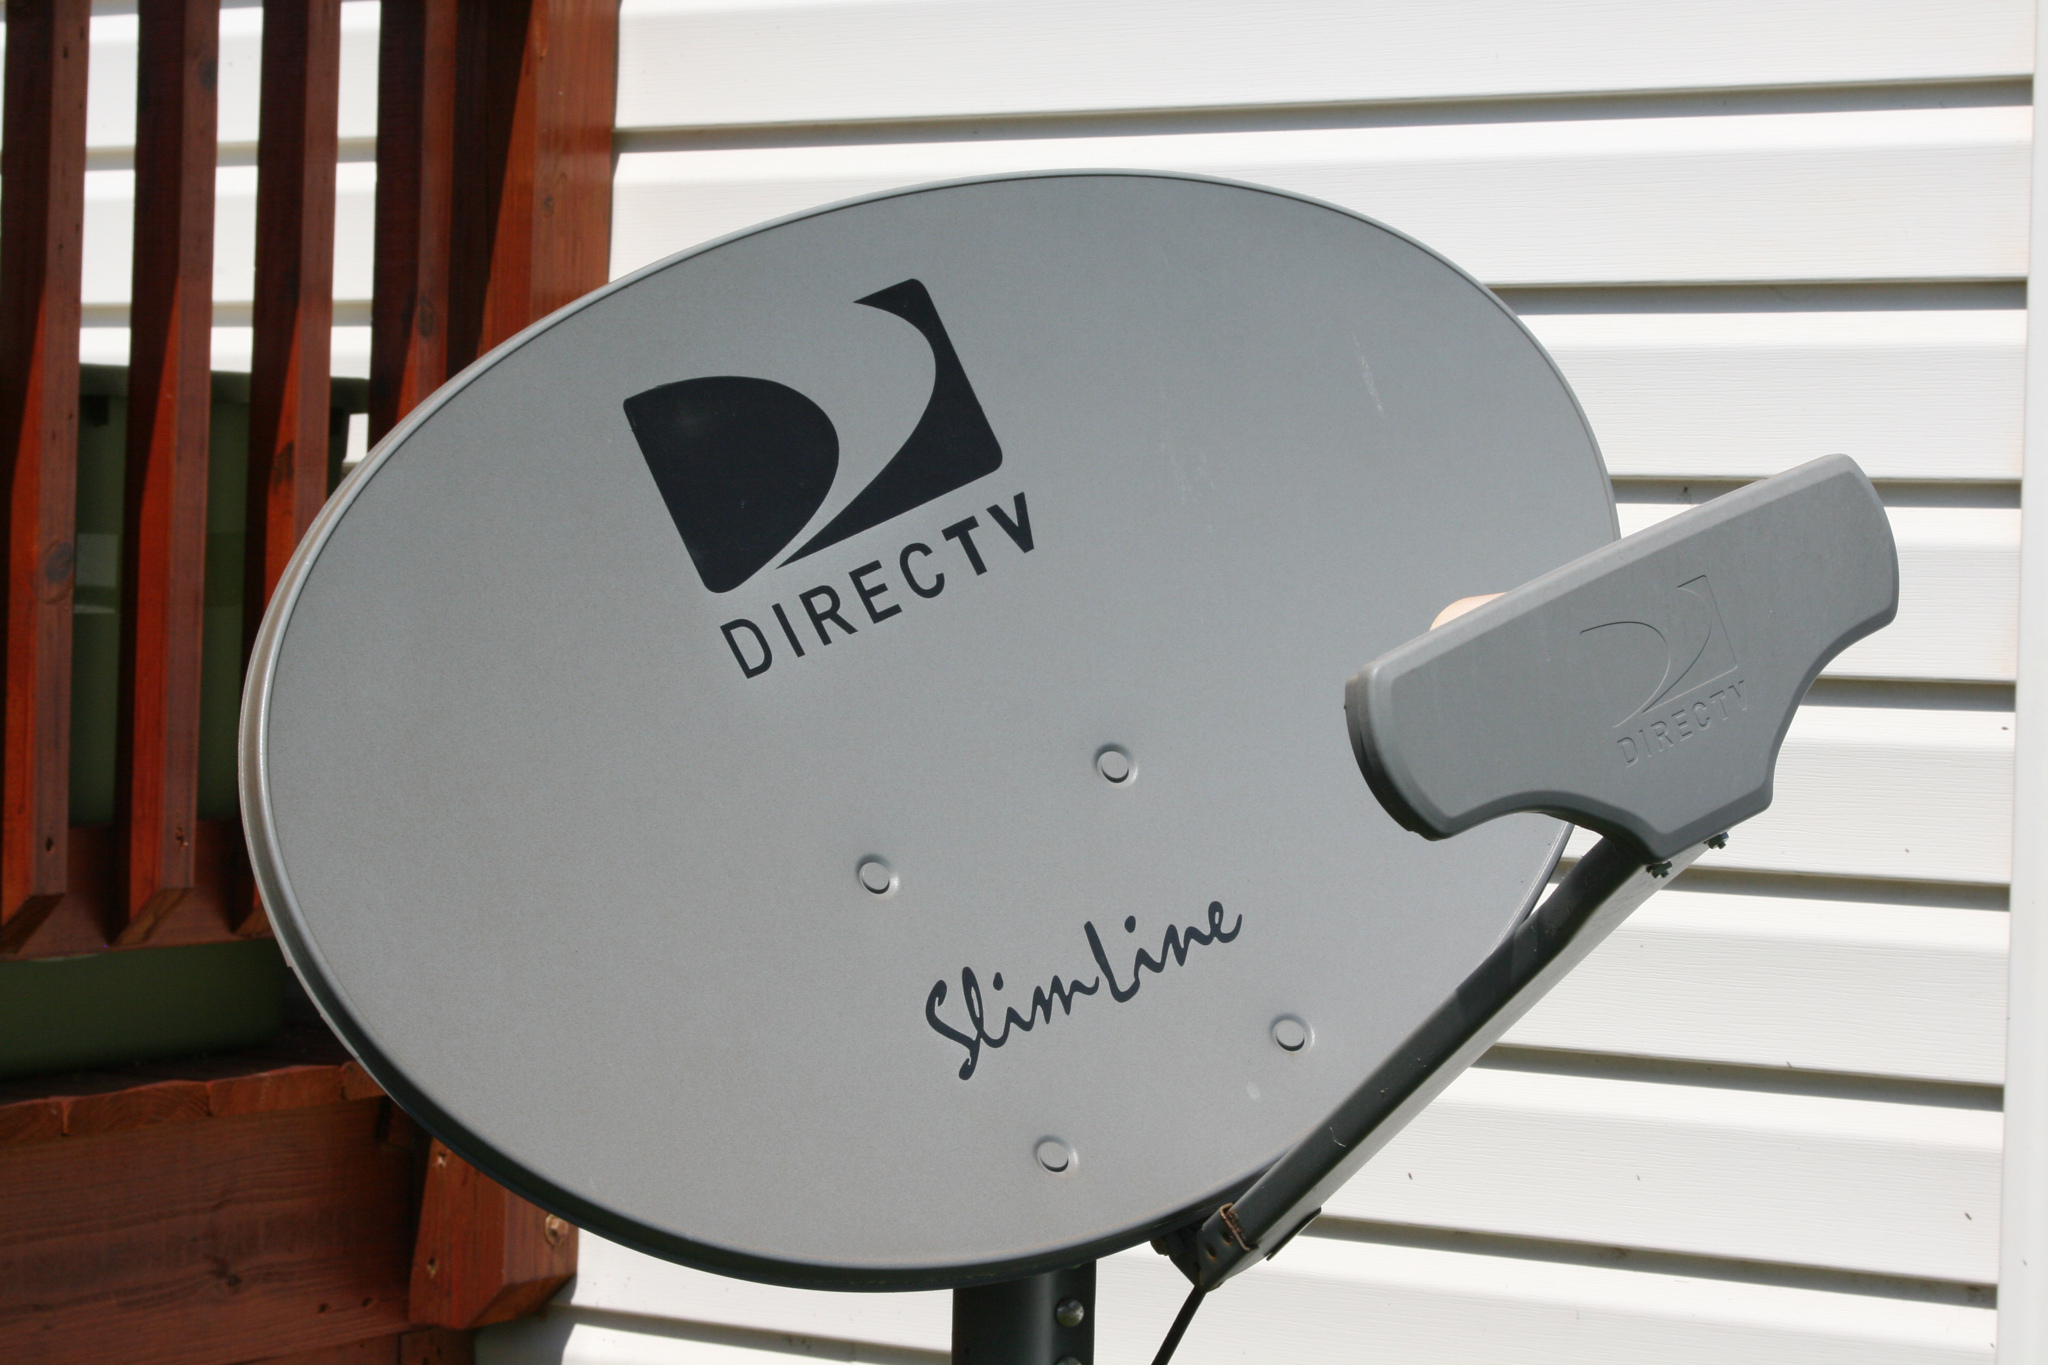 DirecTV_5_LNB_Slimline_2012_06_08.jpg